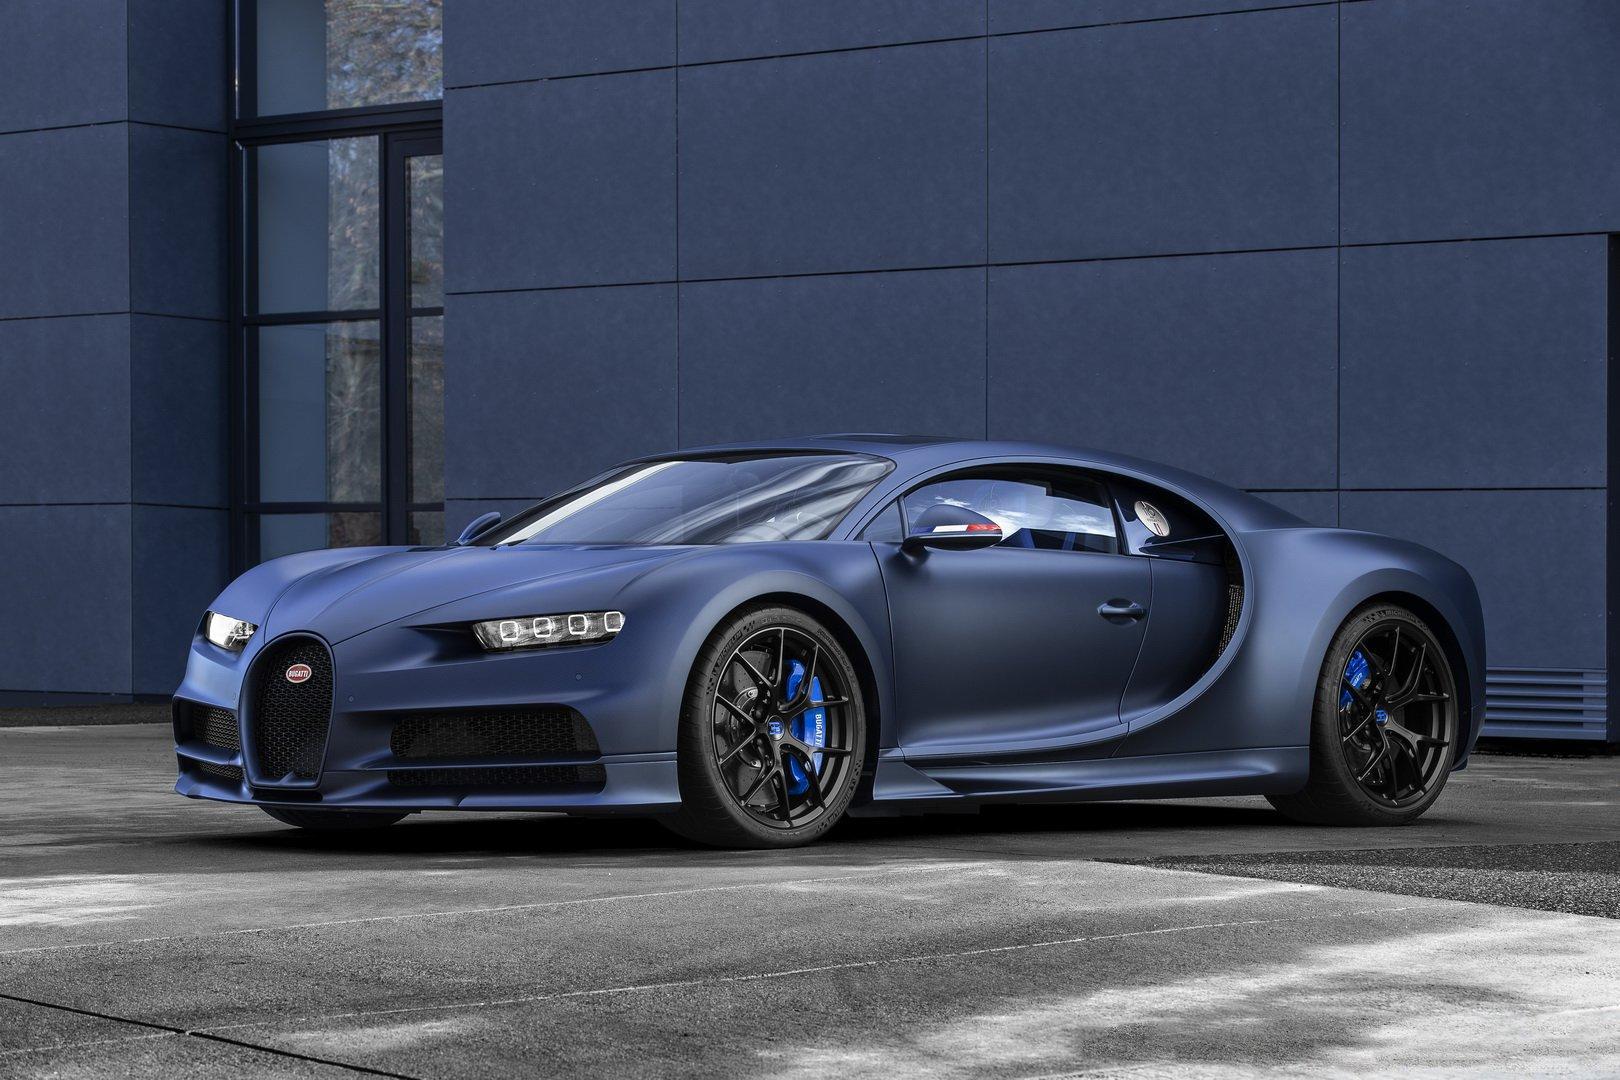 Bugatti Chiron Sport 110 ans Bugatti - Bugatti Chiron Sport 110 ans Bugatti